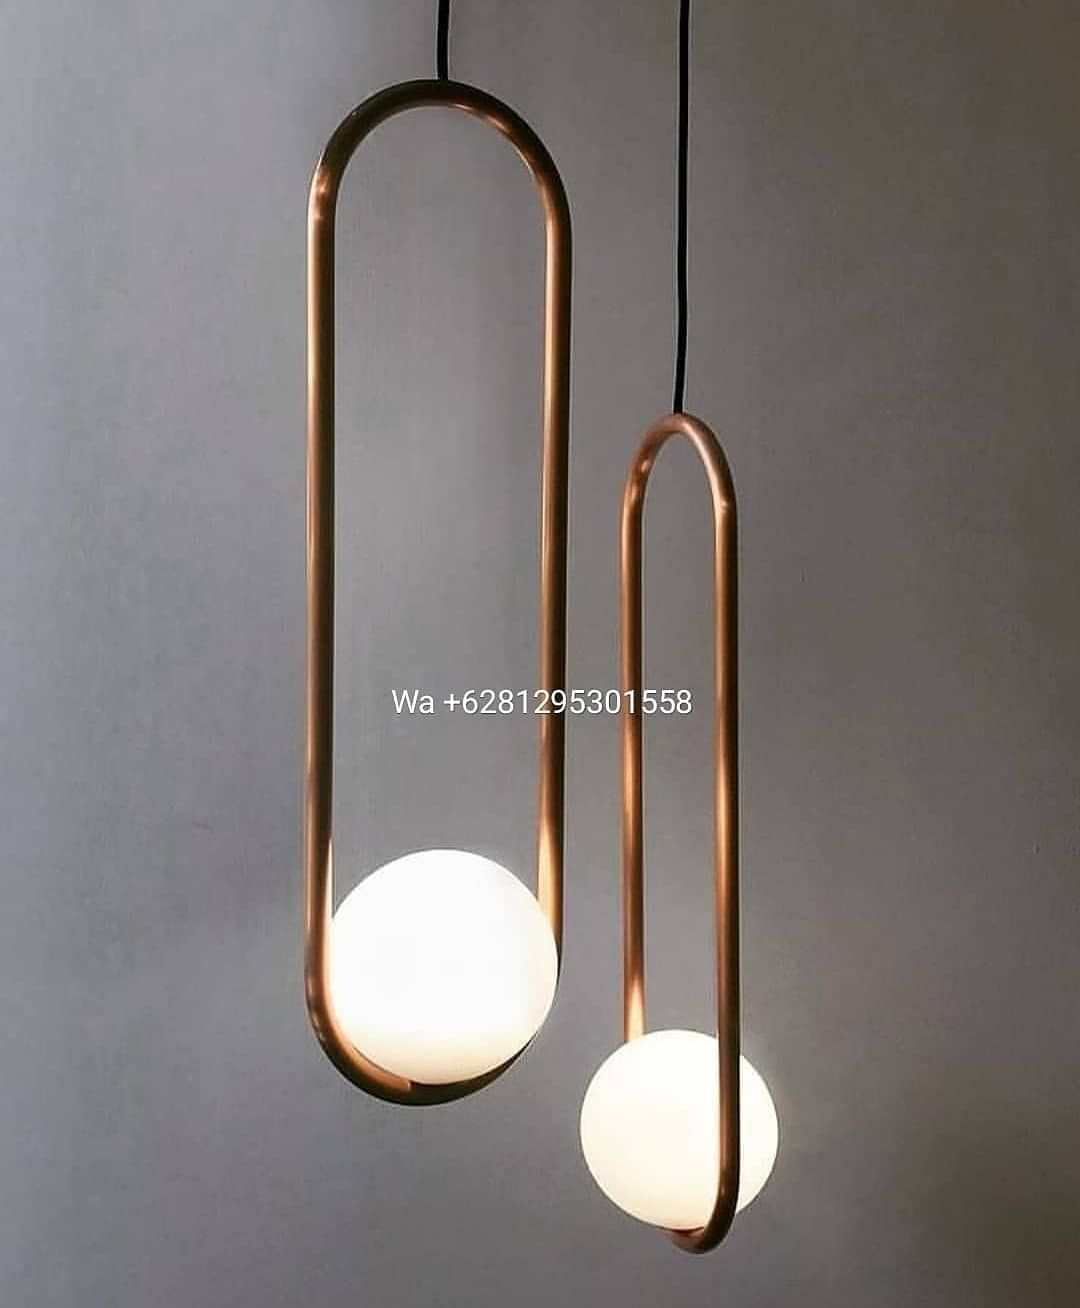 Lampe Design Suggestion De Lampes Insolites Lampe Lampes